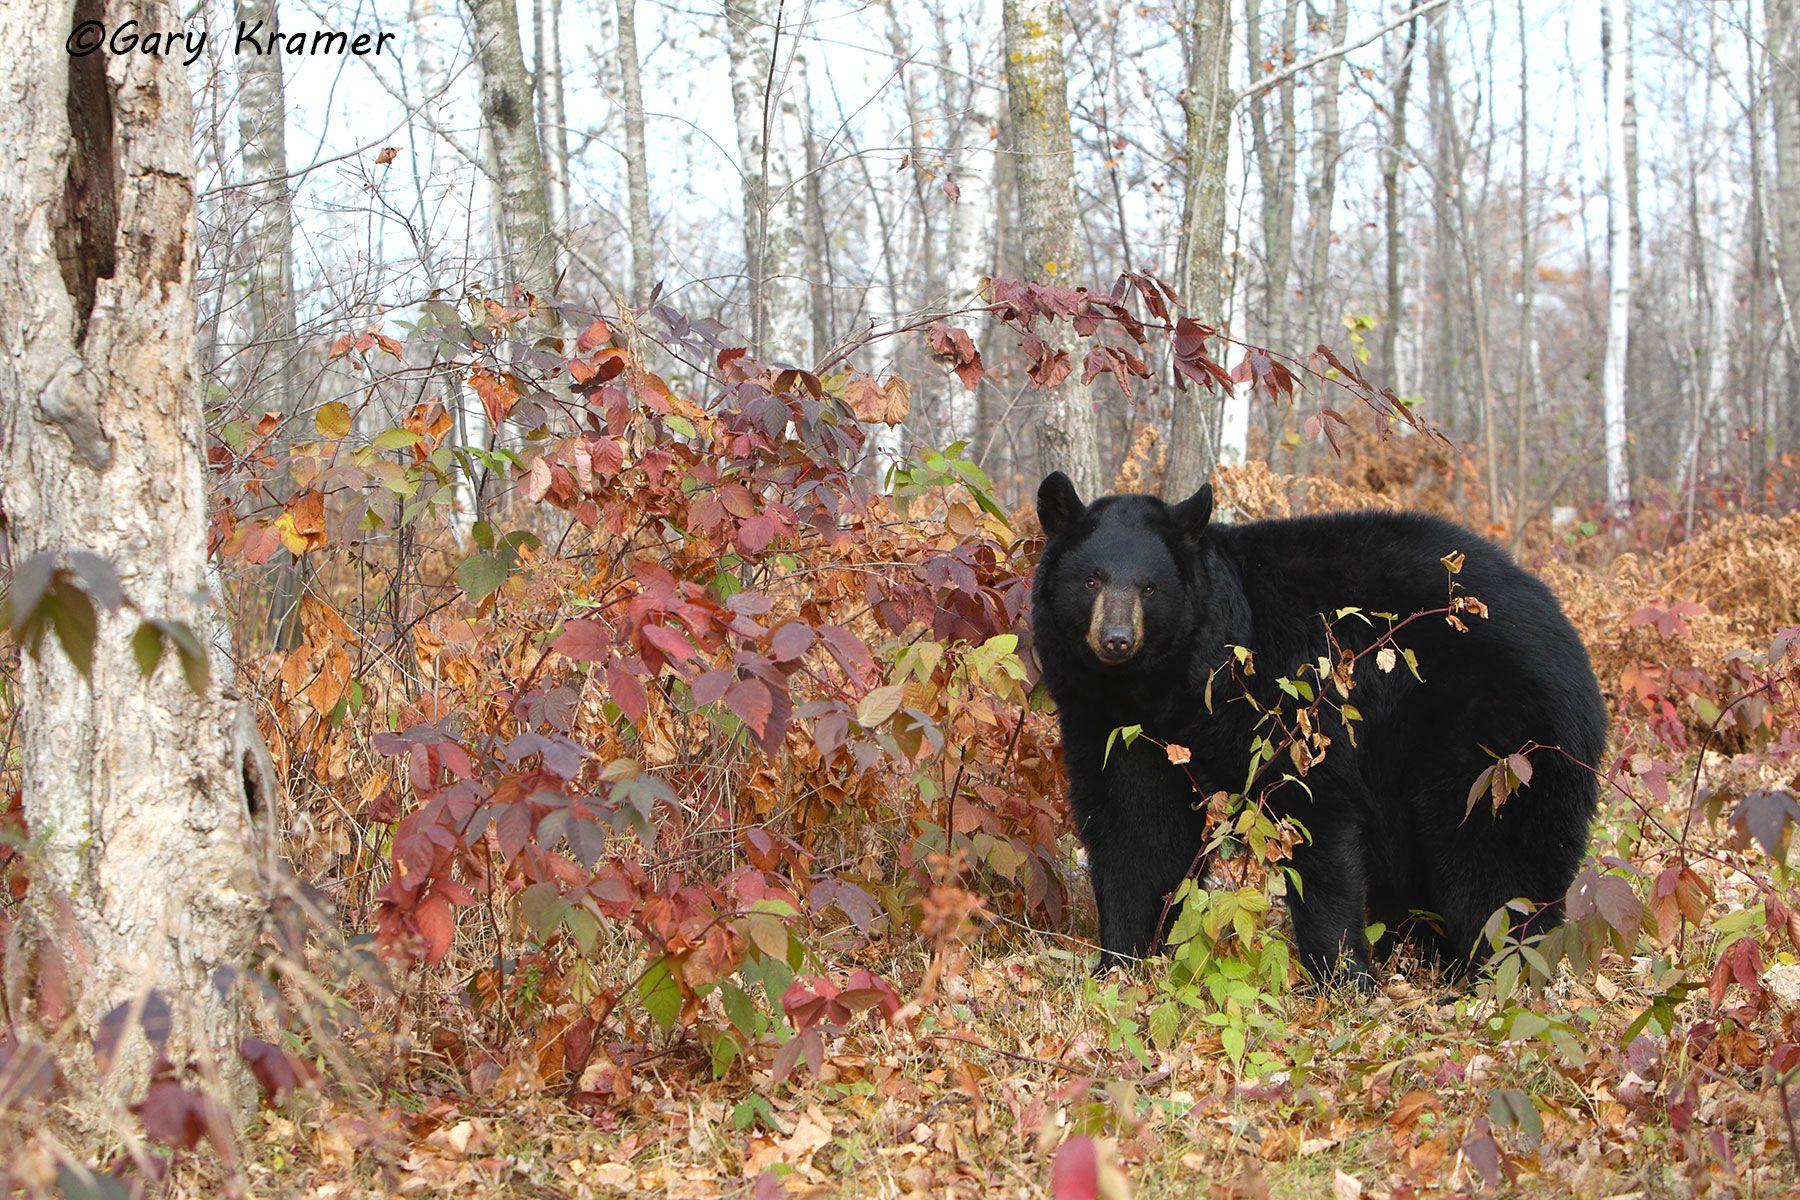 Black Bear (Urusus americanus) - NMBb#808d